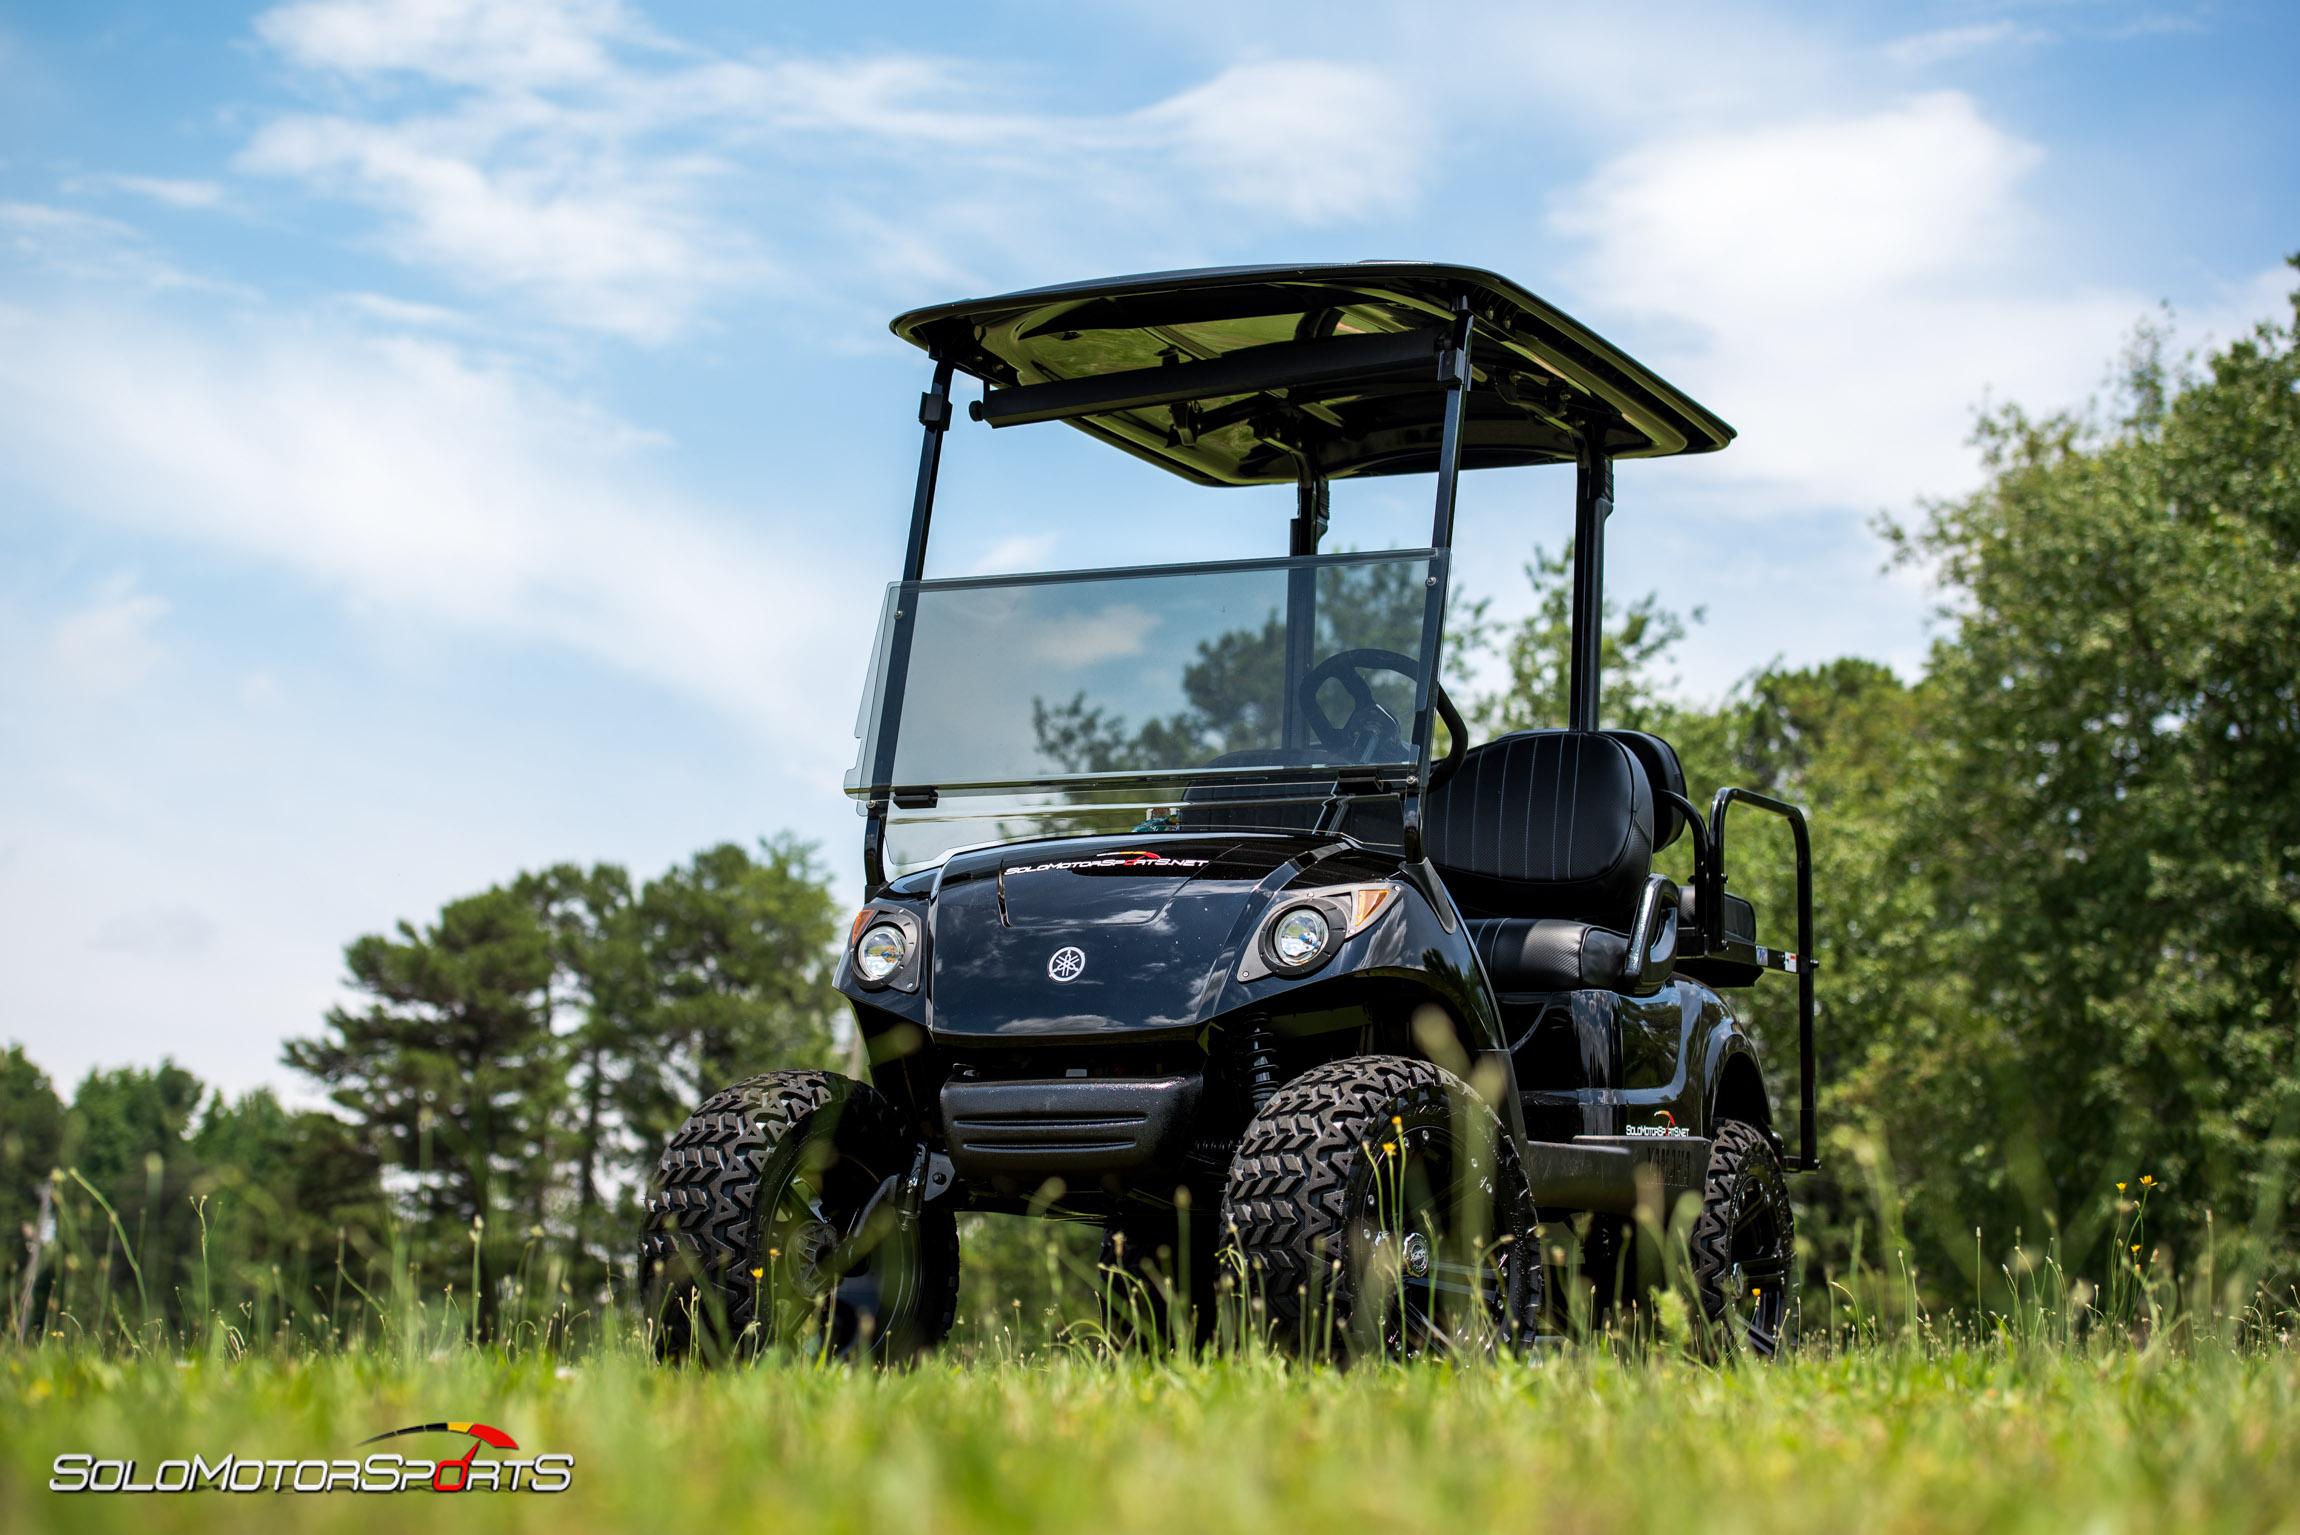 solo mnotorsports, golfcart, custom, fabrication, monster, crewcab,